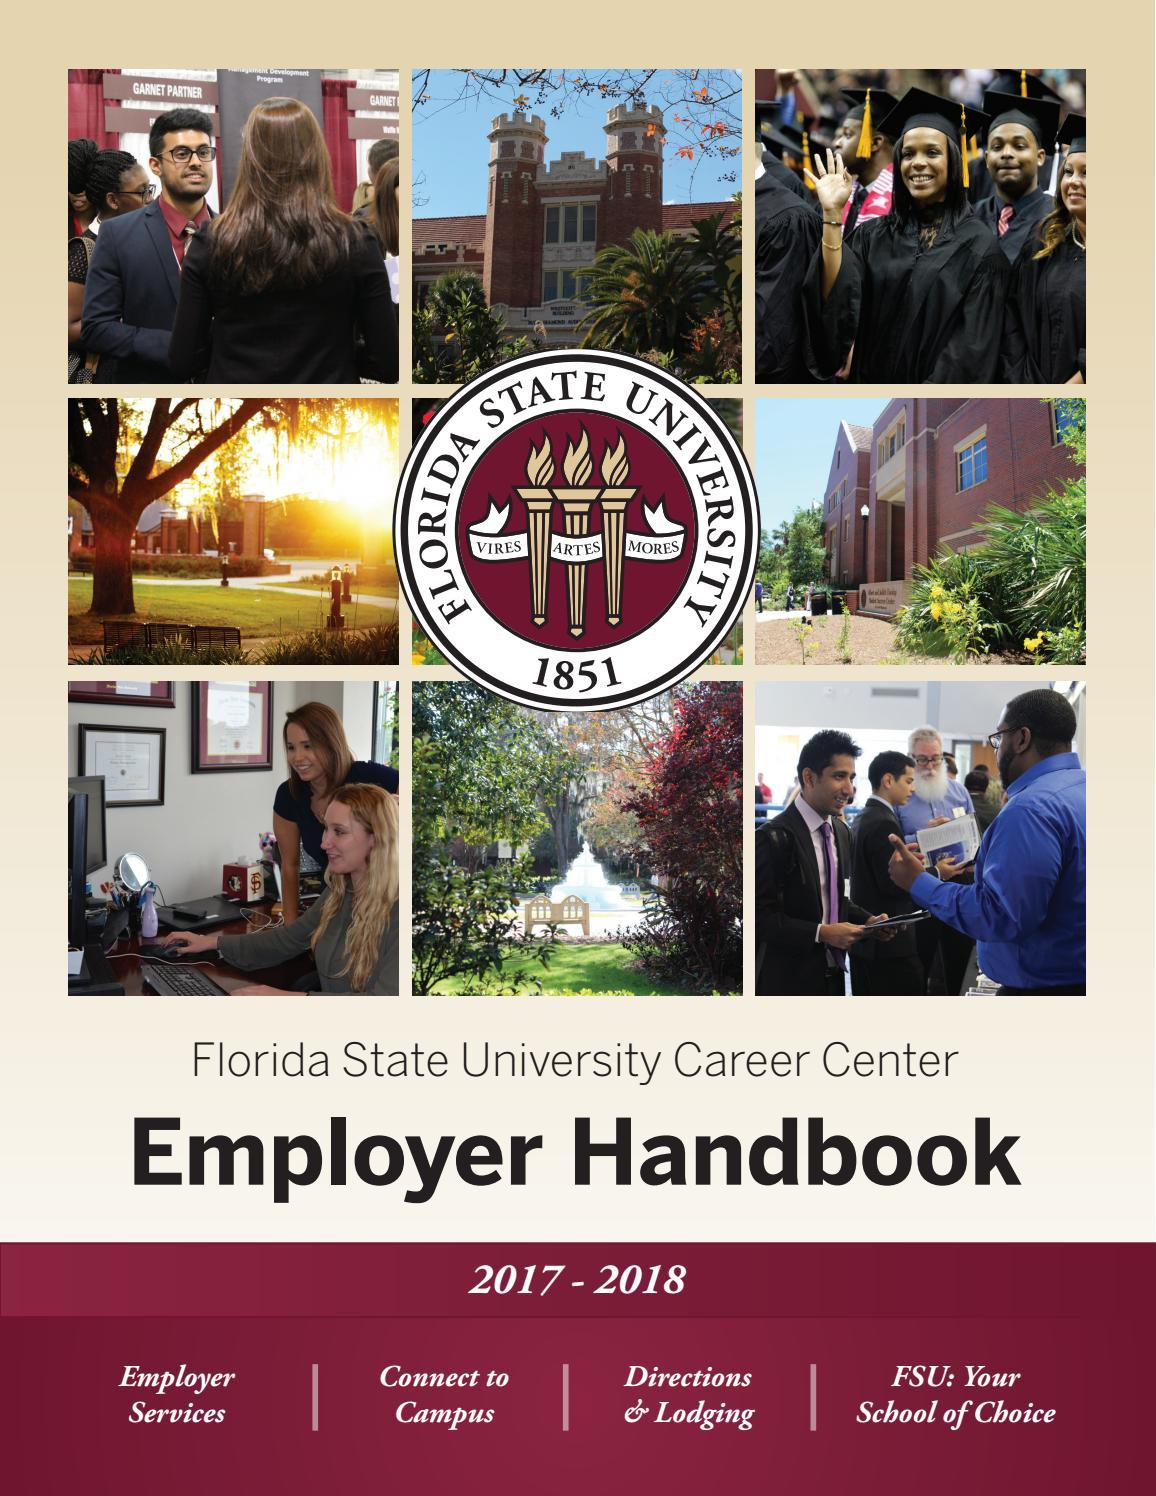 FSU Employer Handbook 2017-2018 by Florida State University